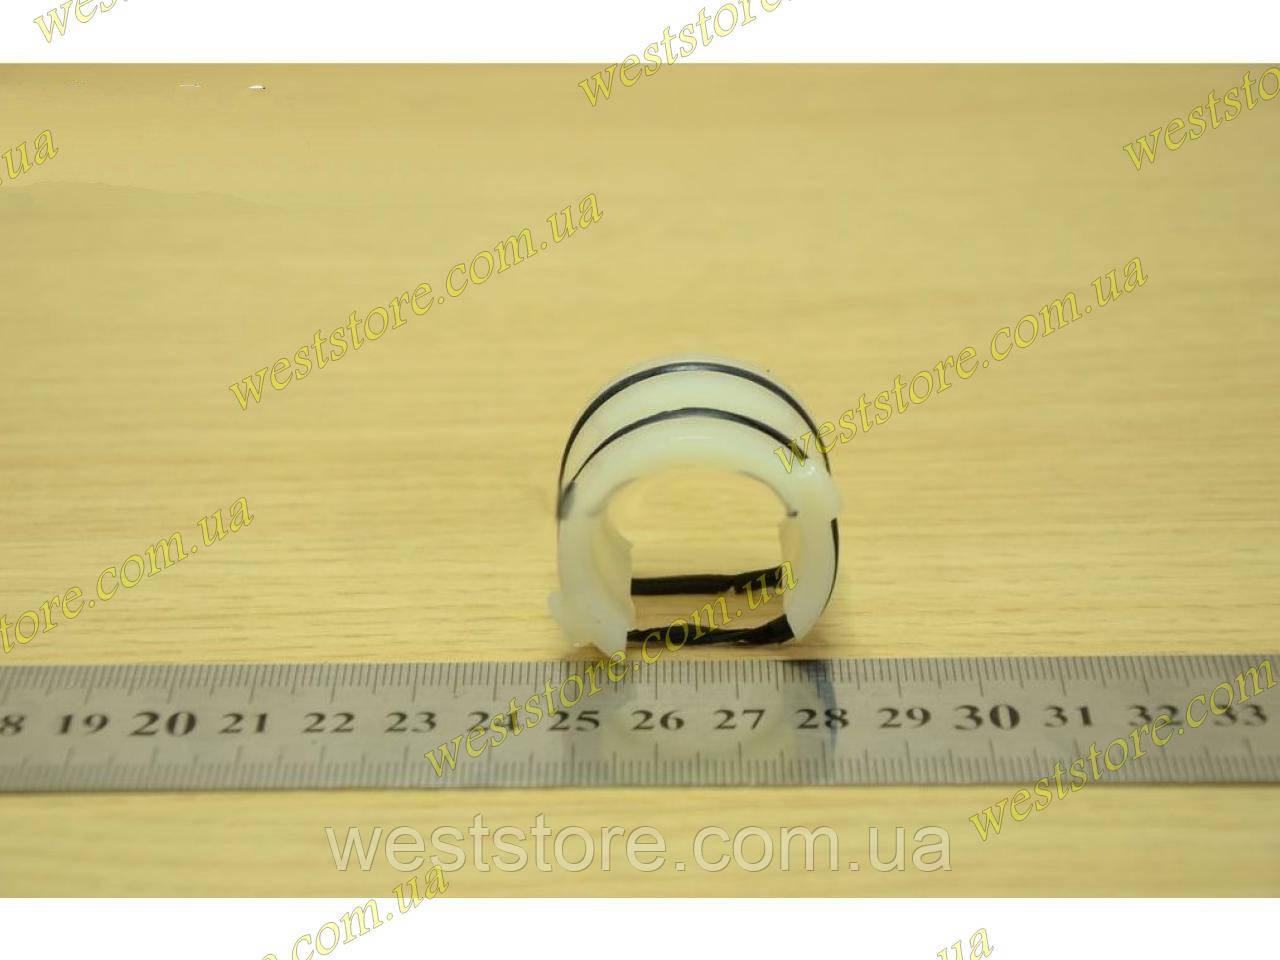 Втулка рулевой рейки Ваз 2108 2109 21099 2115 ДААЗ (втулка+ 2 резинки)